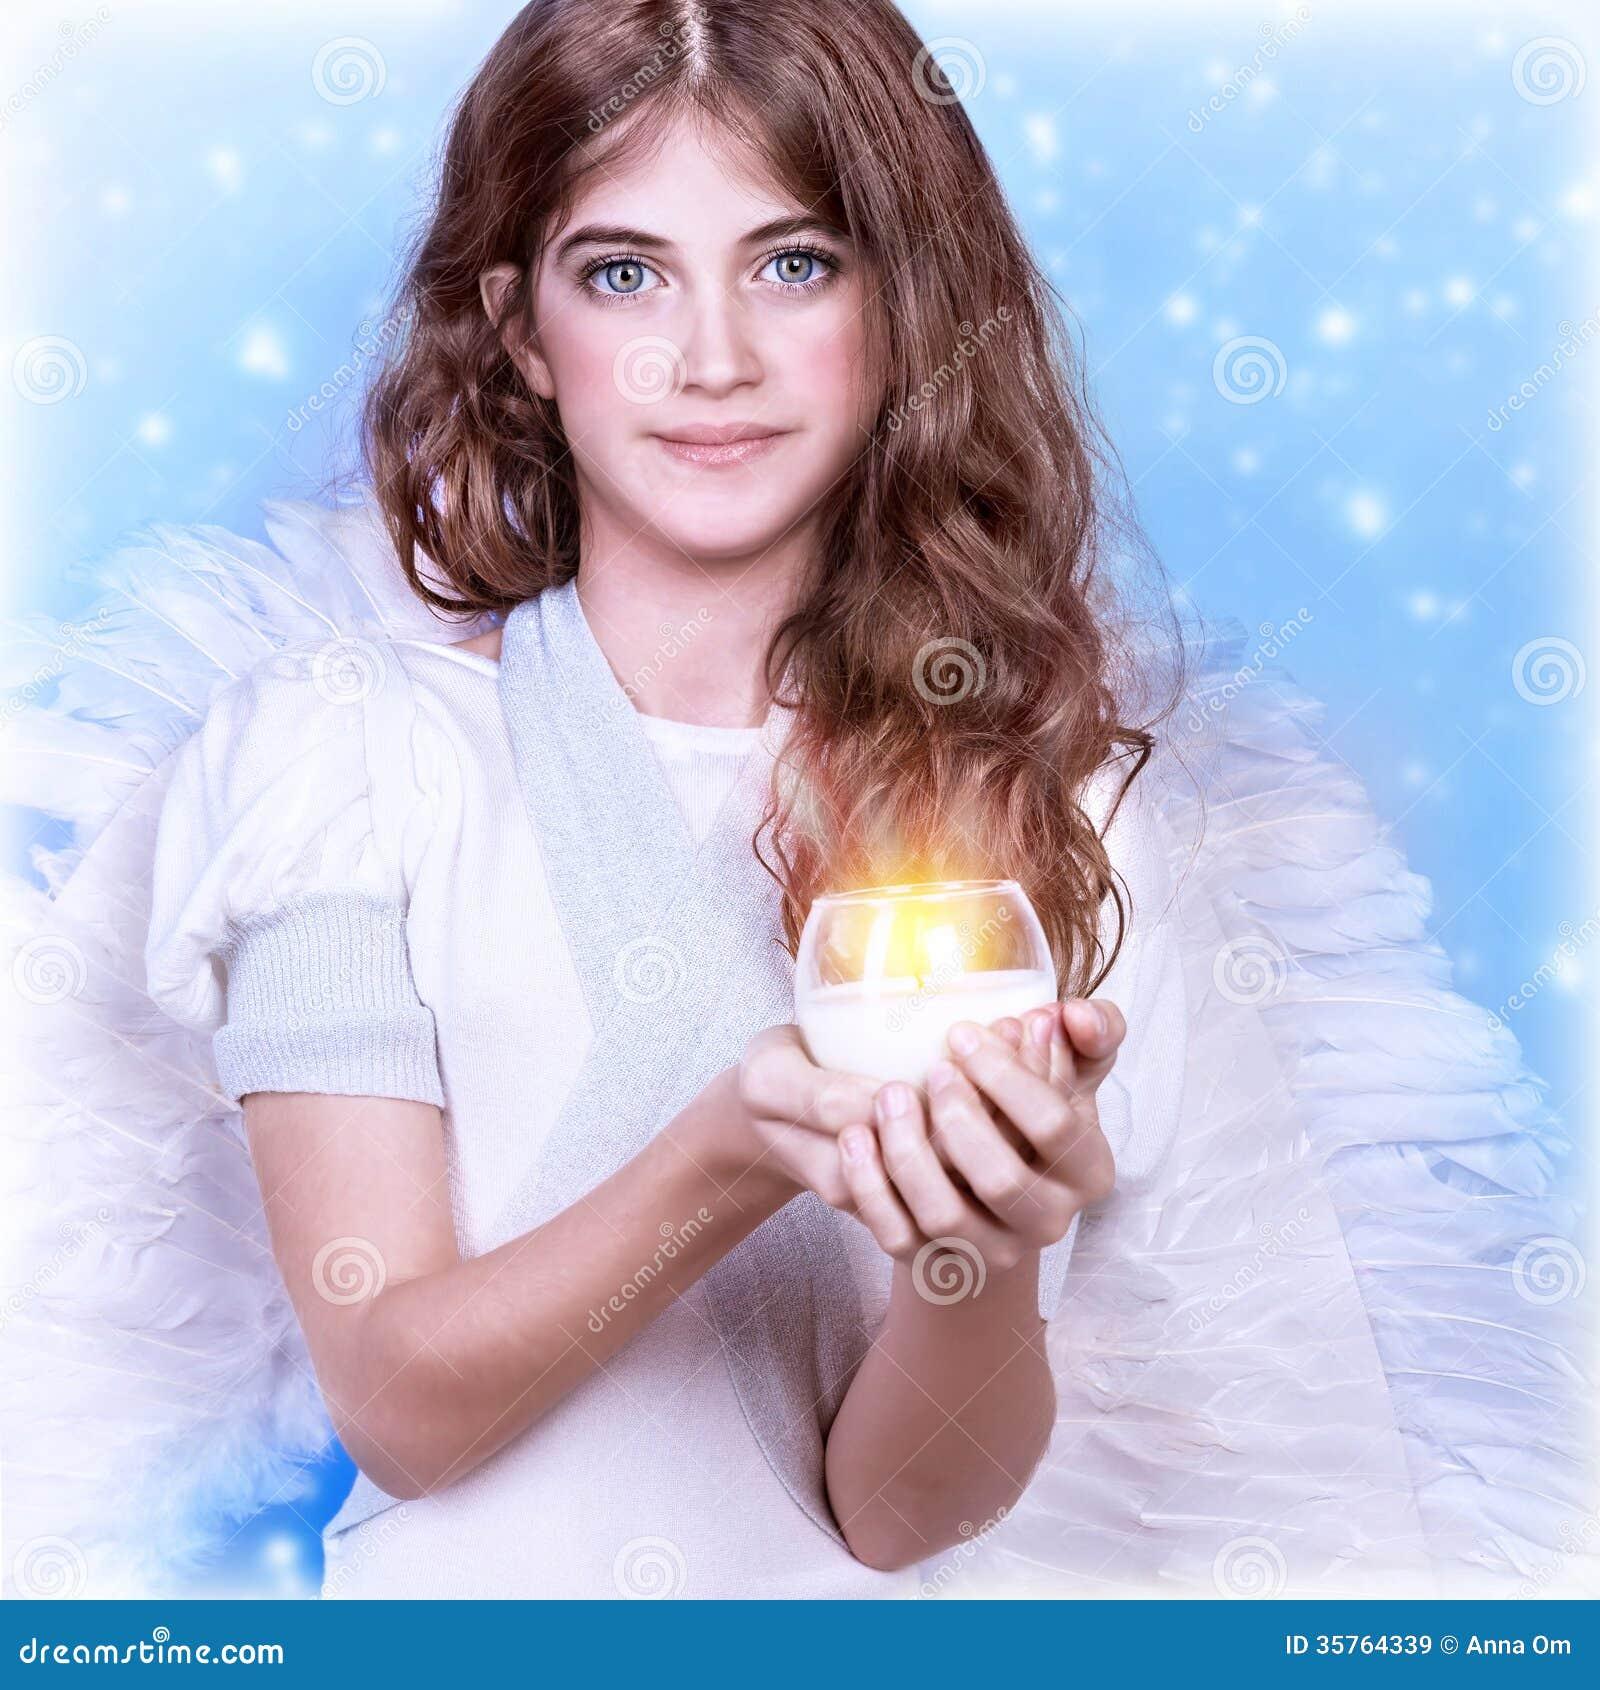 Фото anal teen angels 3 фотография